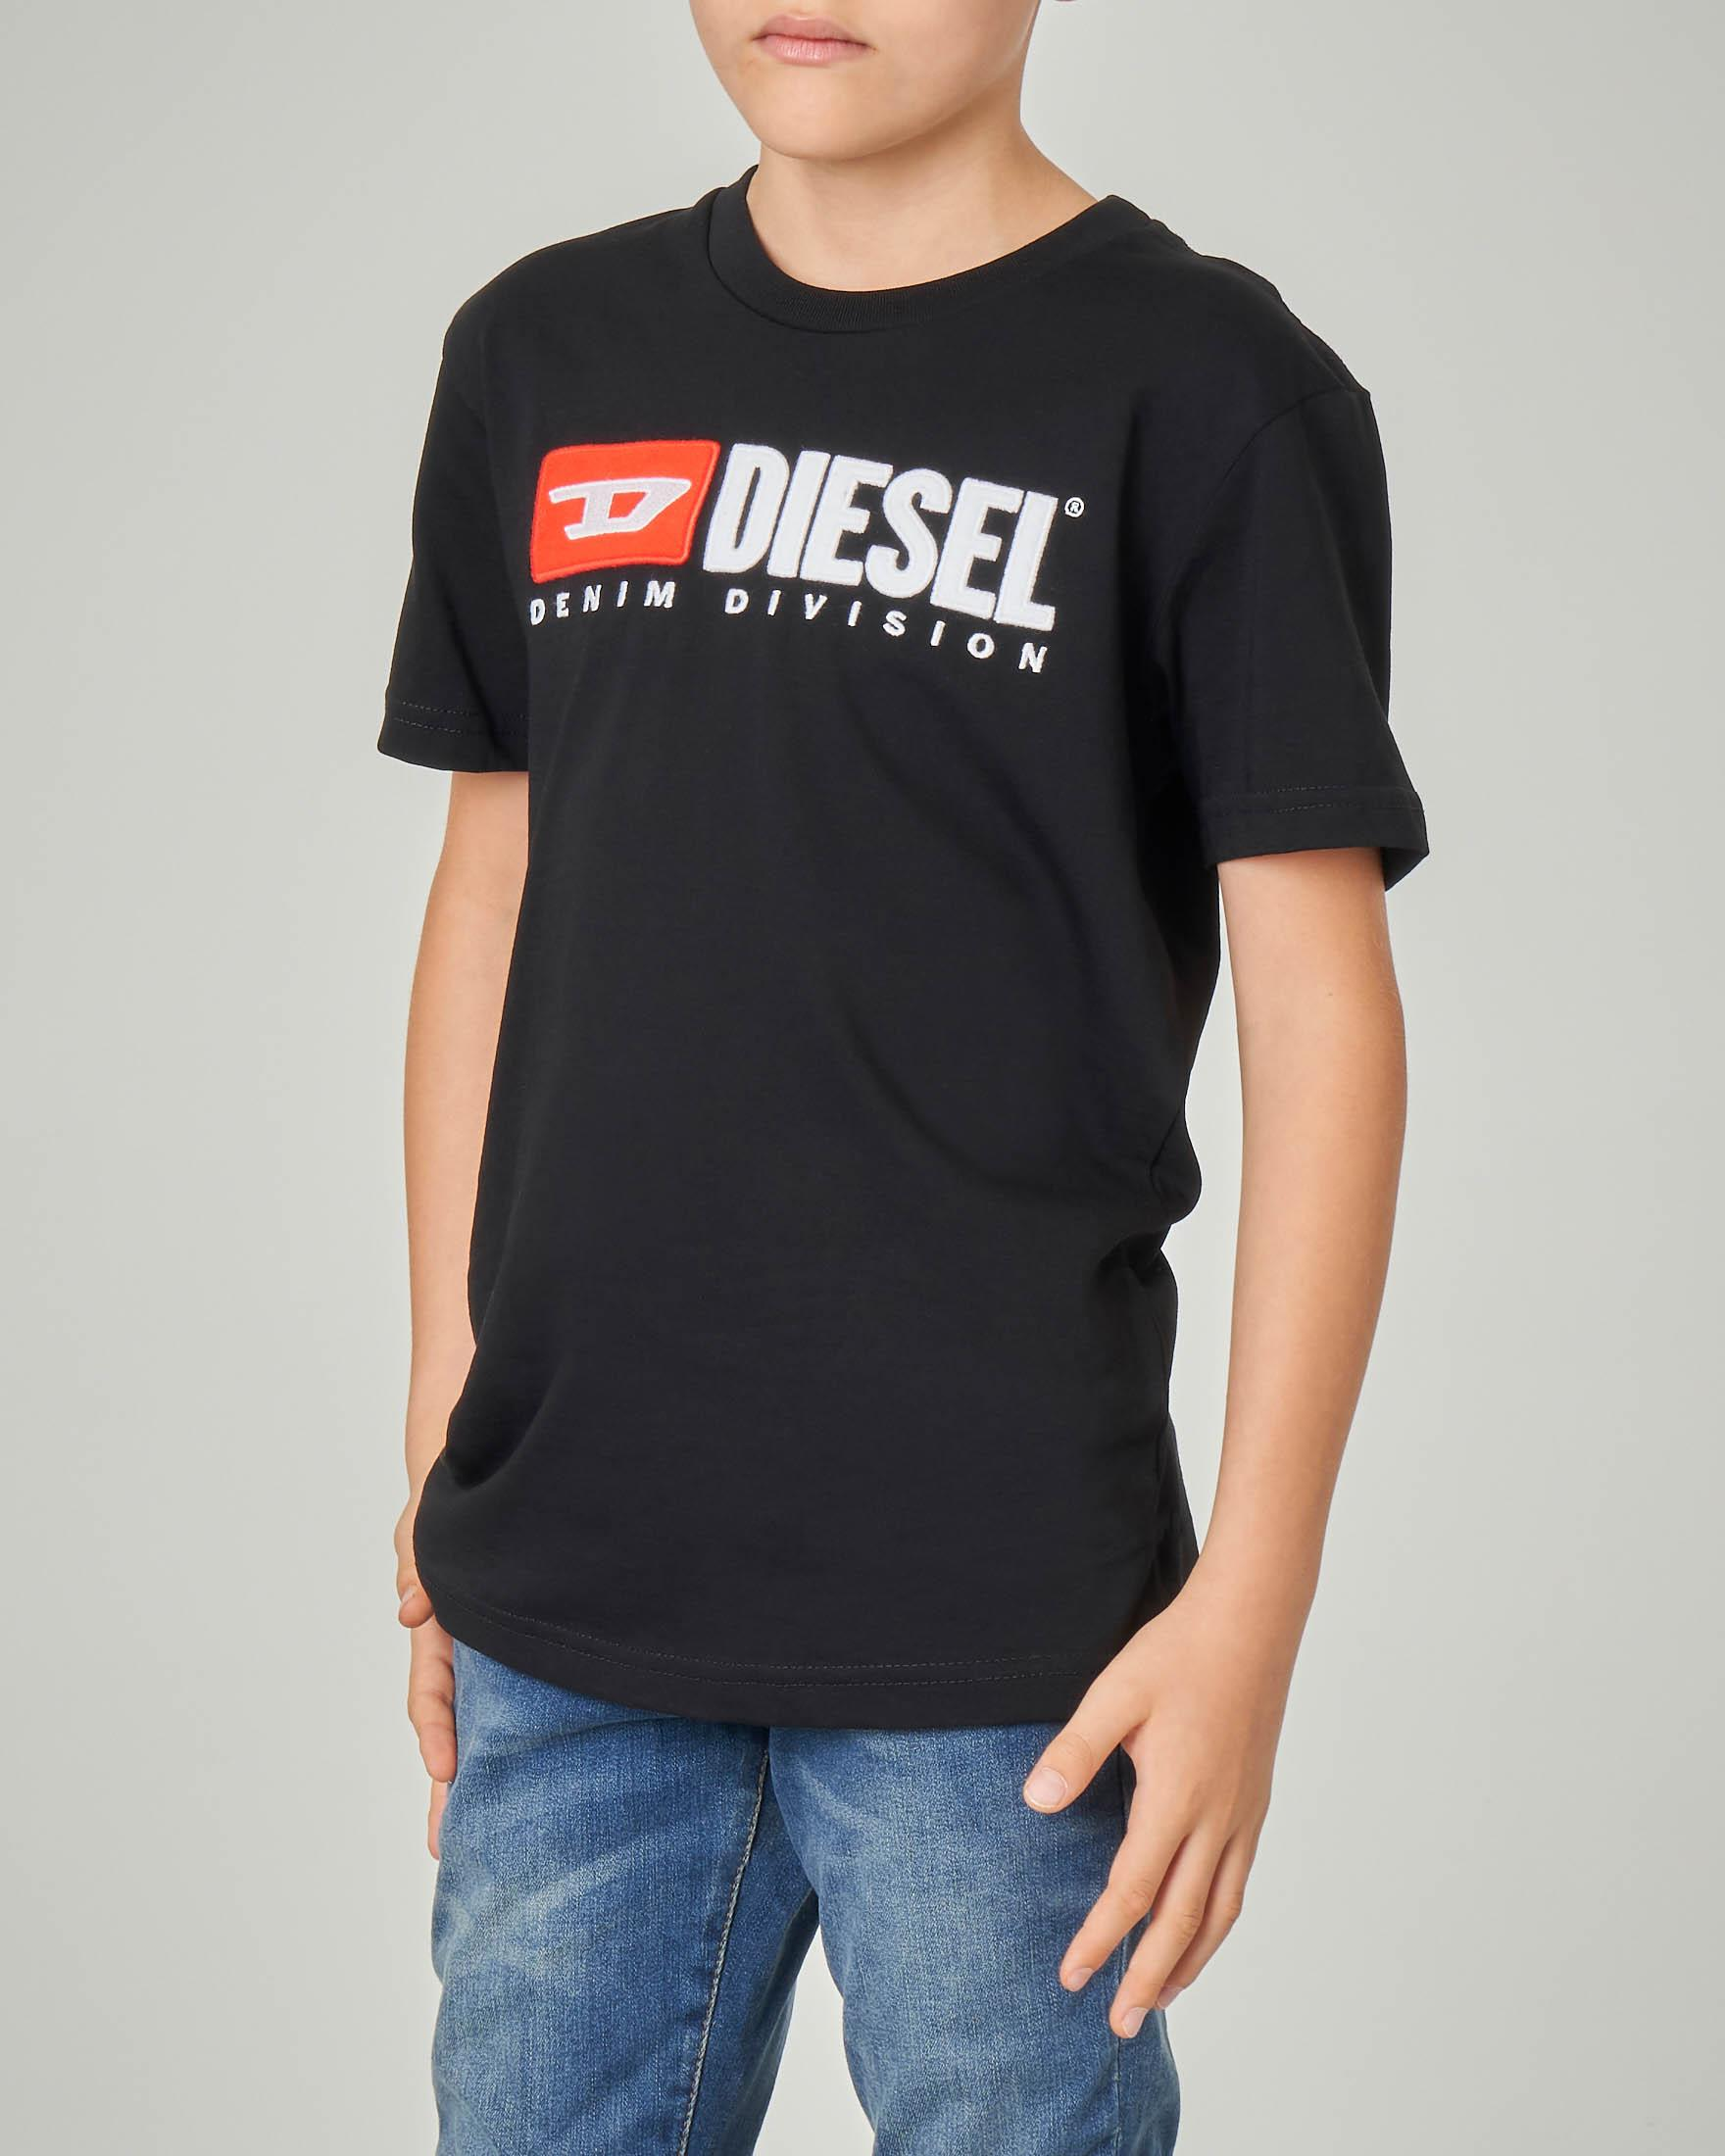 T-shirt nera con logo vintage in feltro 8-16 anni